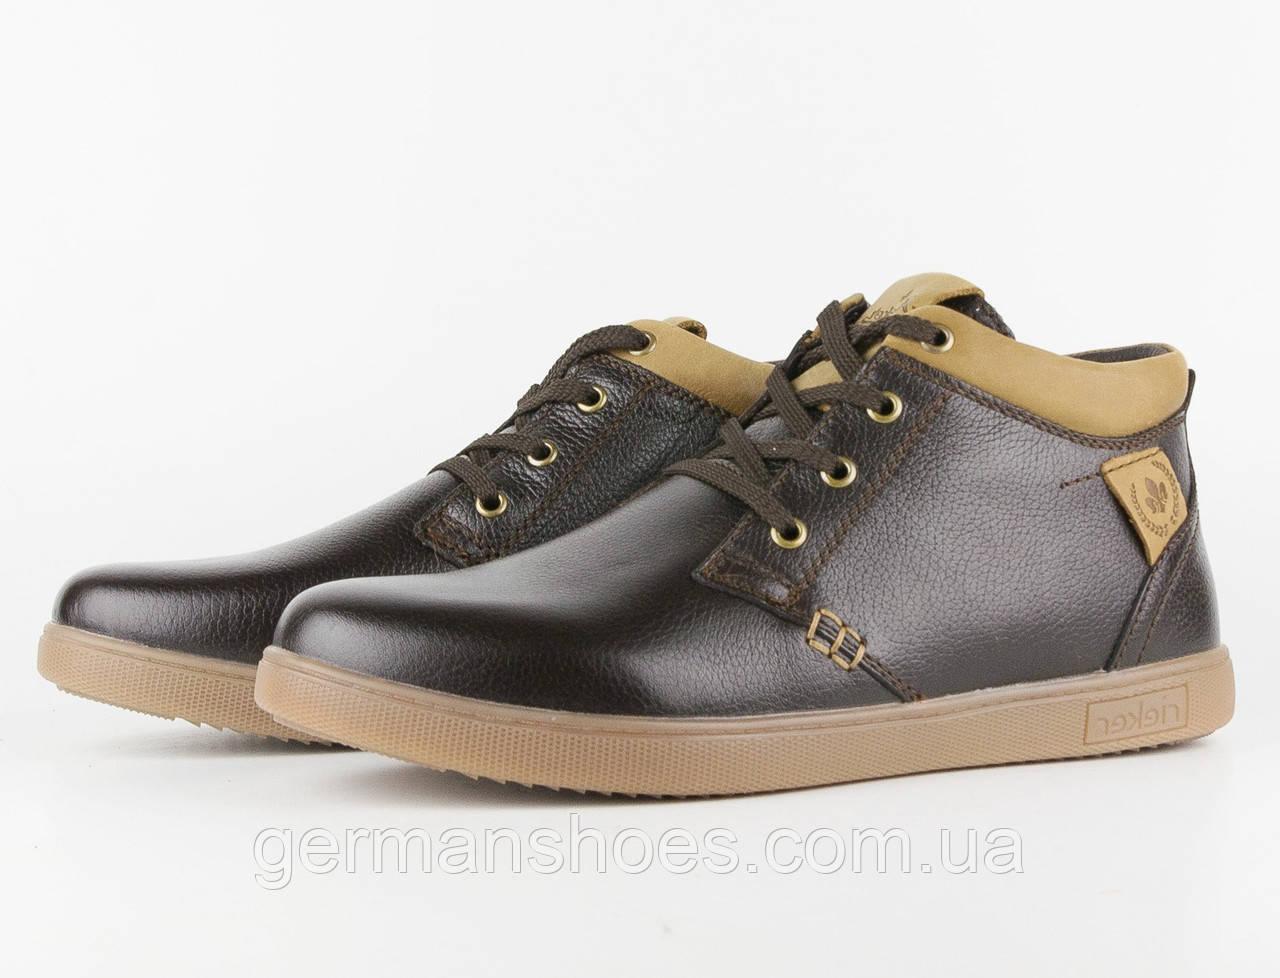 e0643922f065 Ботинки мужские Rieker F9931-25 - Интернет-магазин обуви